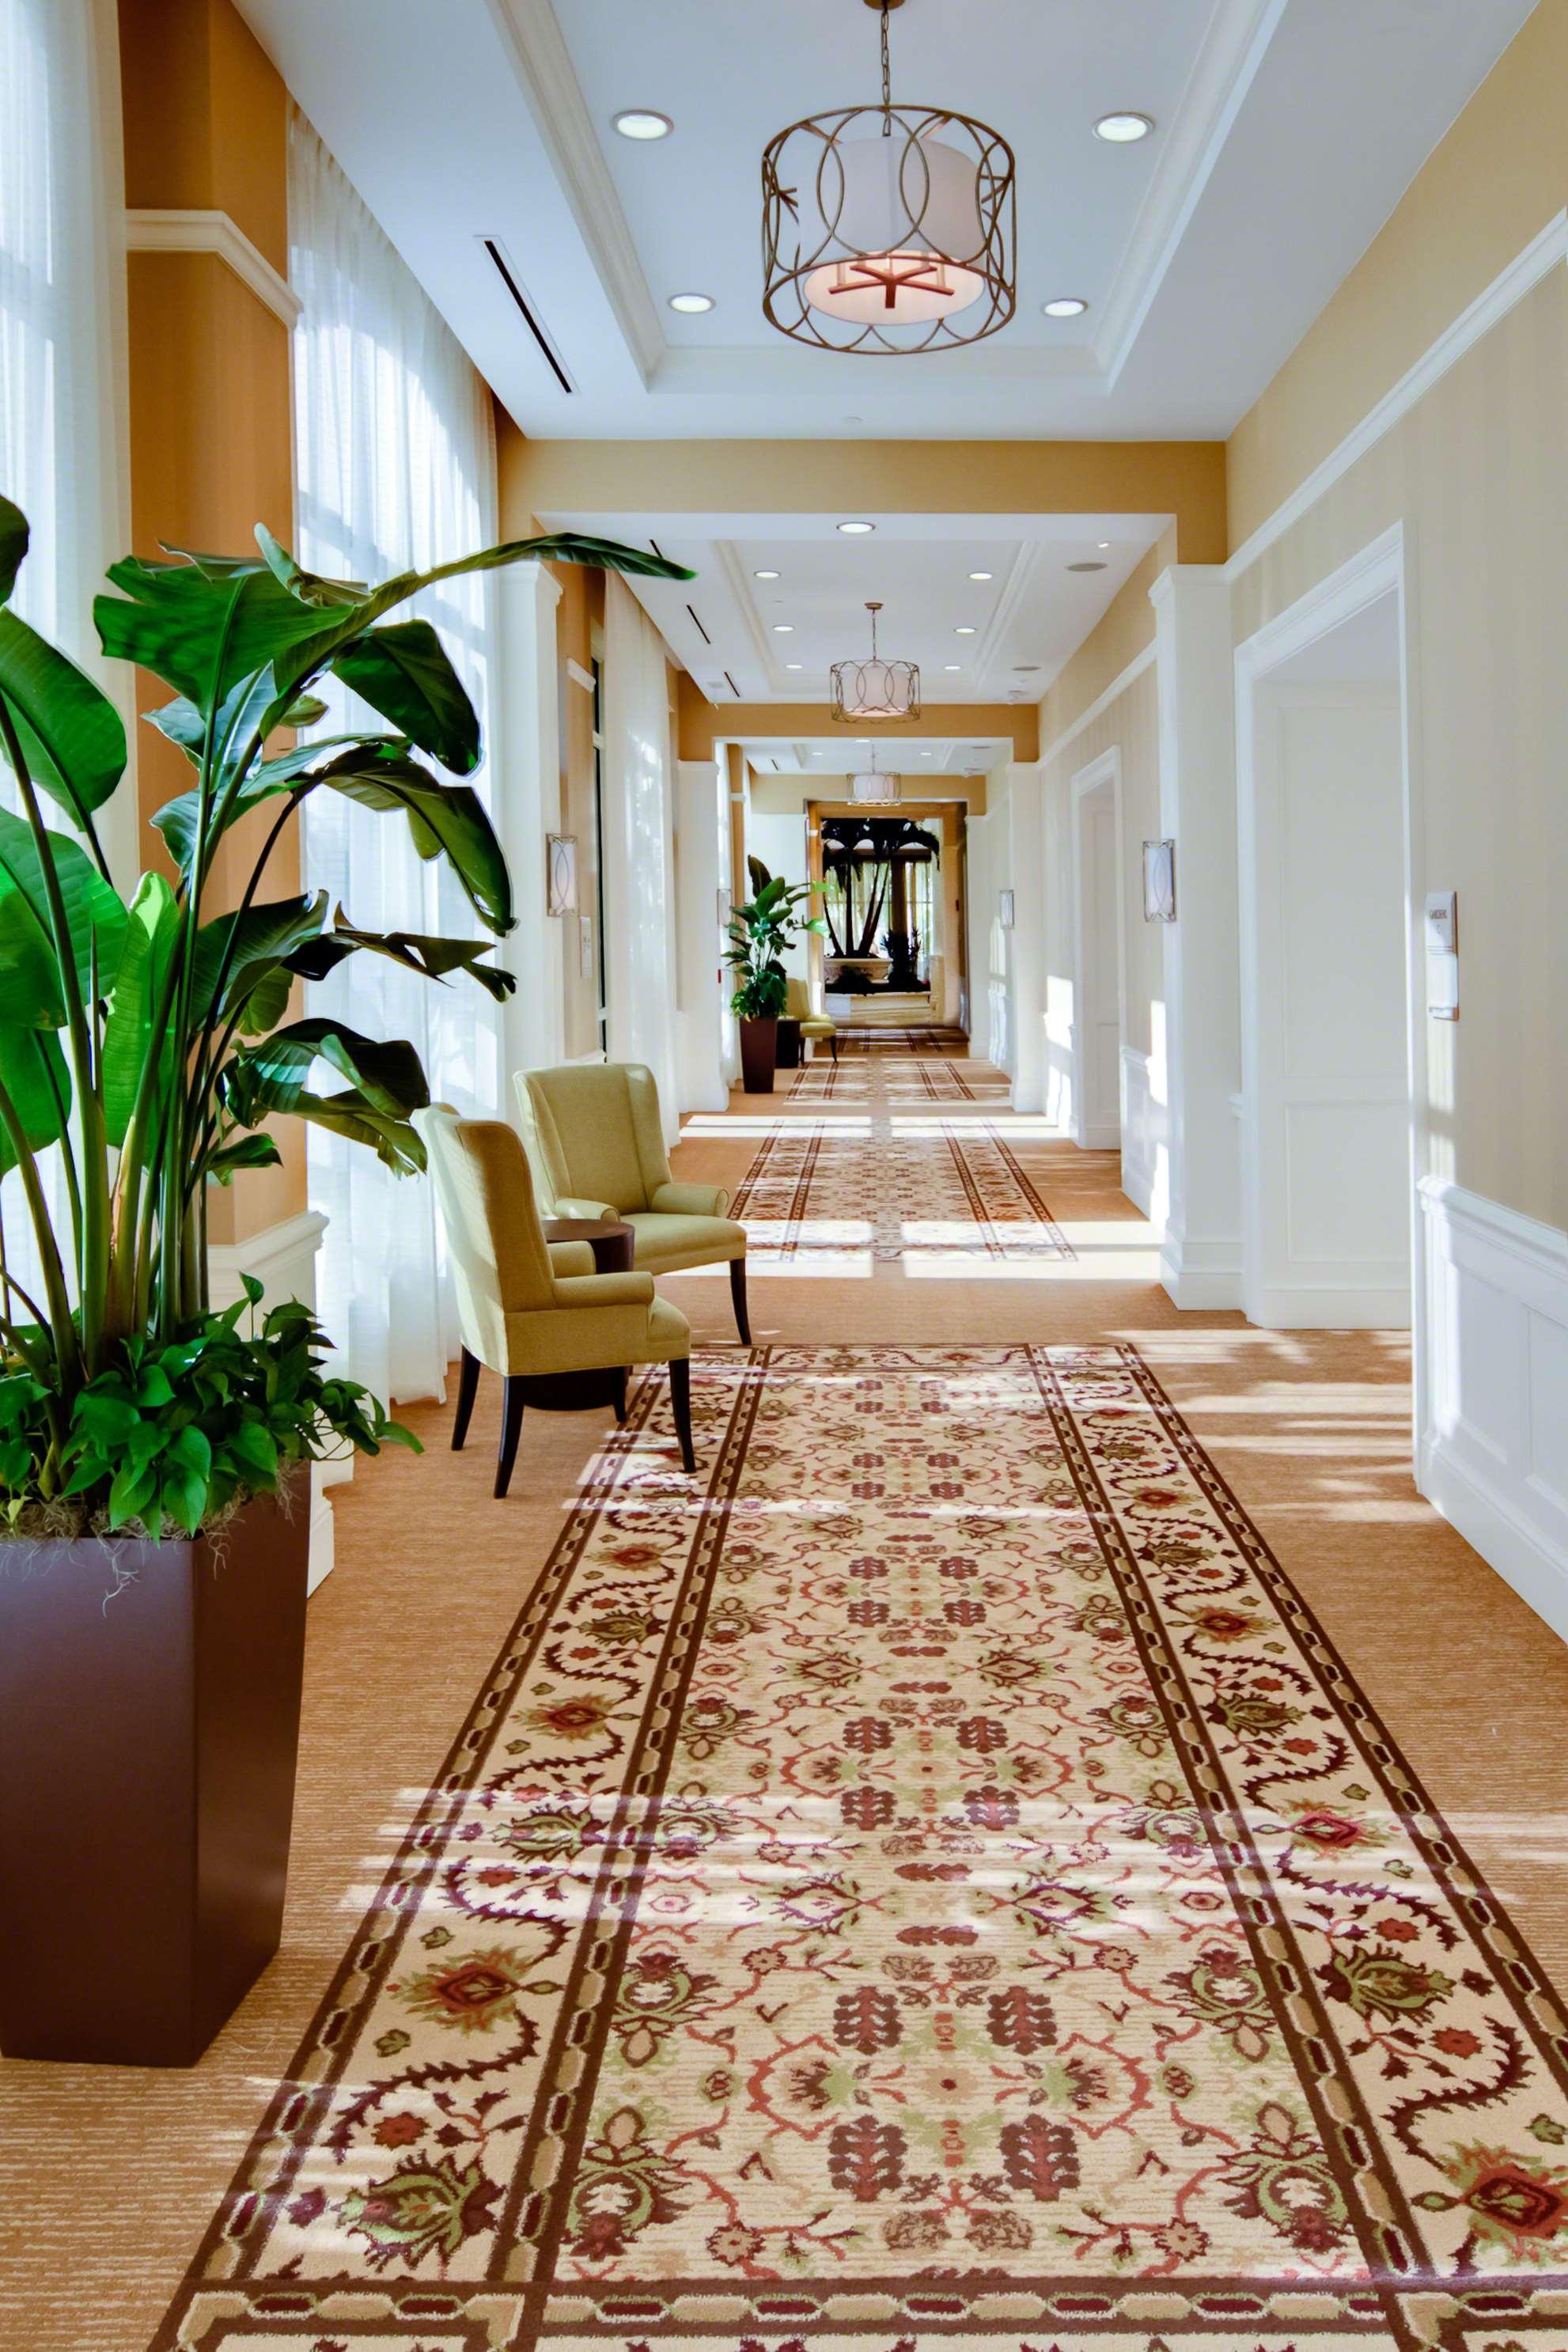 Hilton Garden Inn Palm Beach Gardens image 4